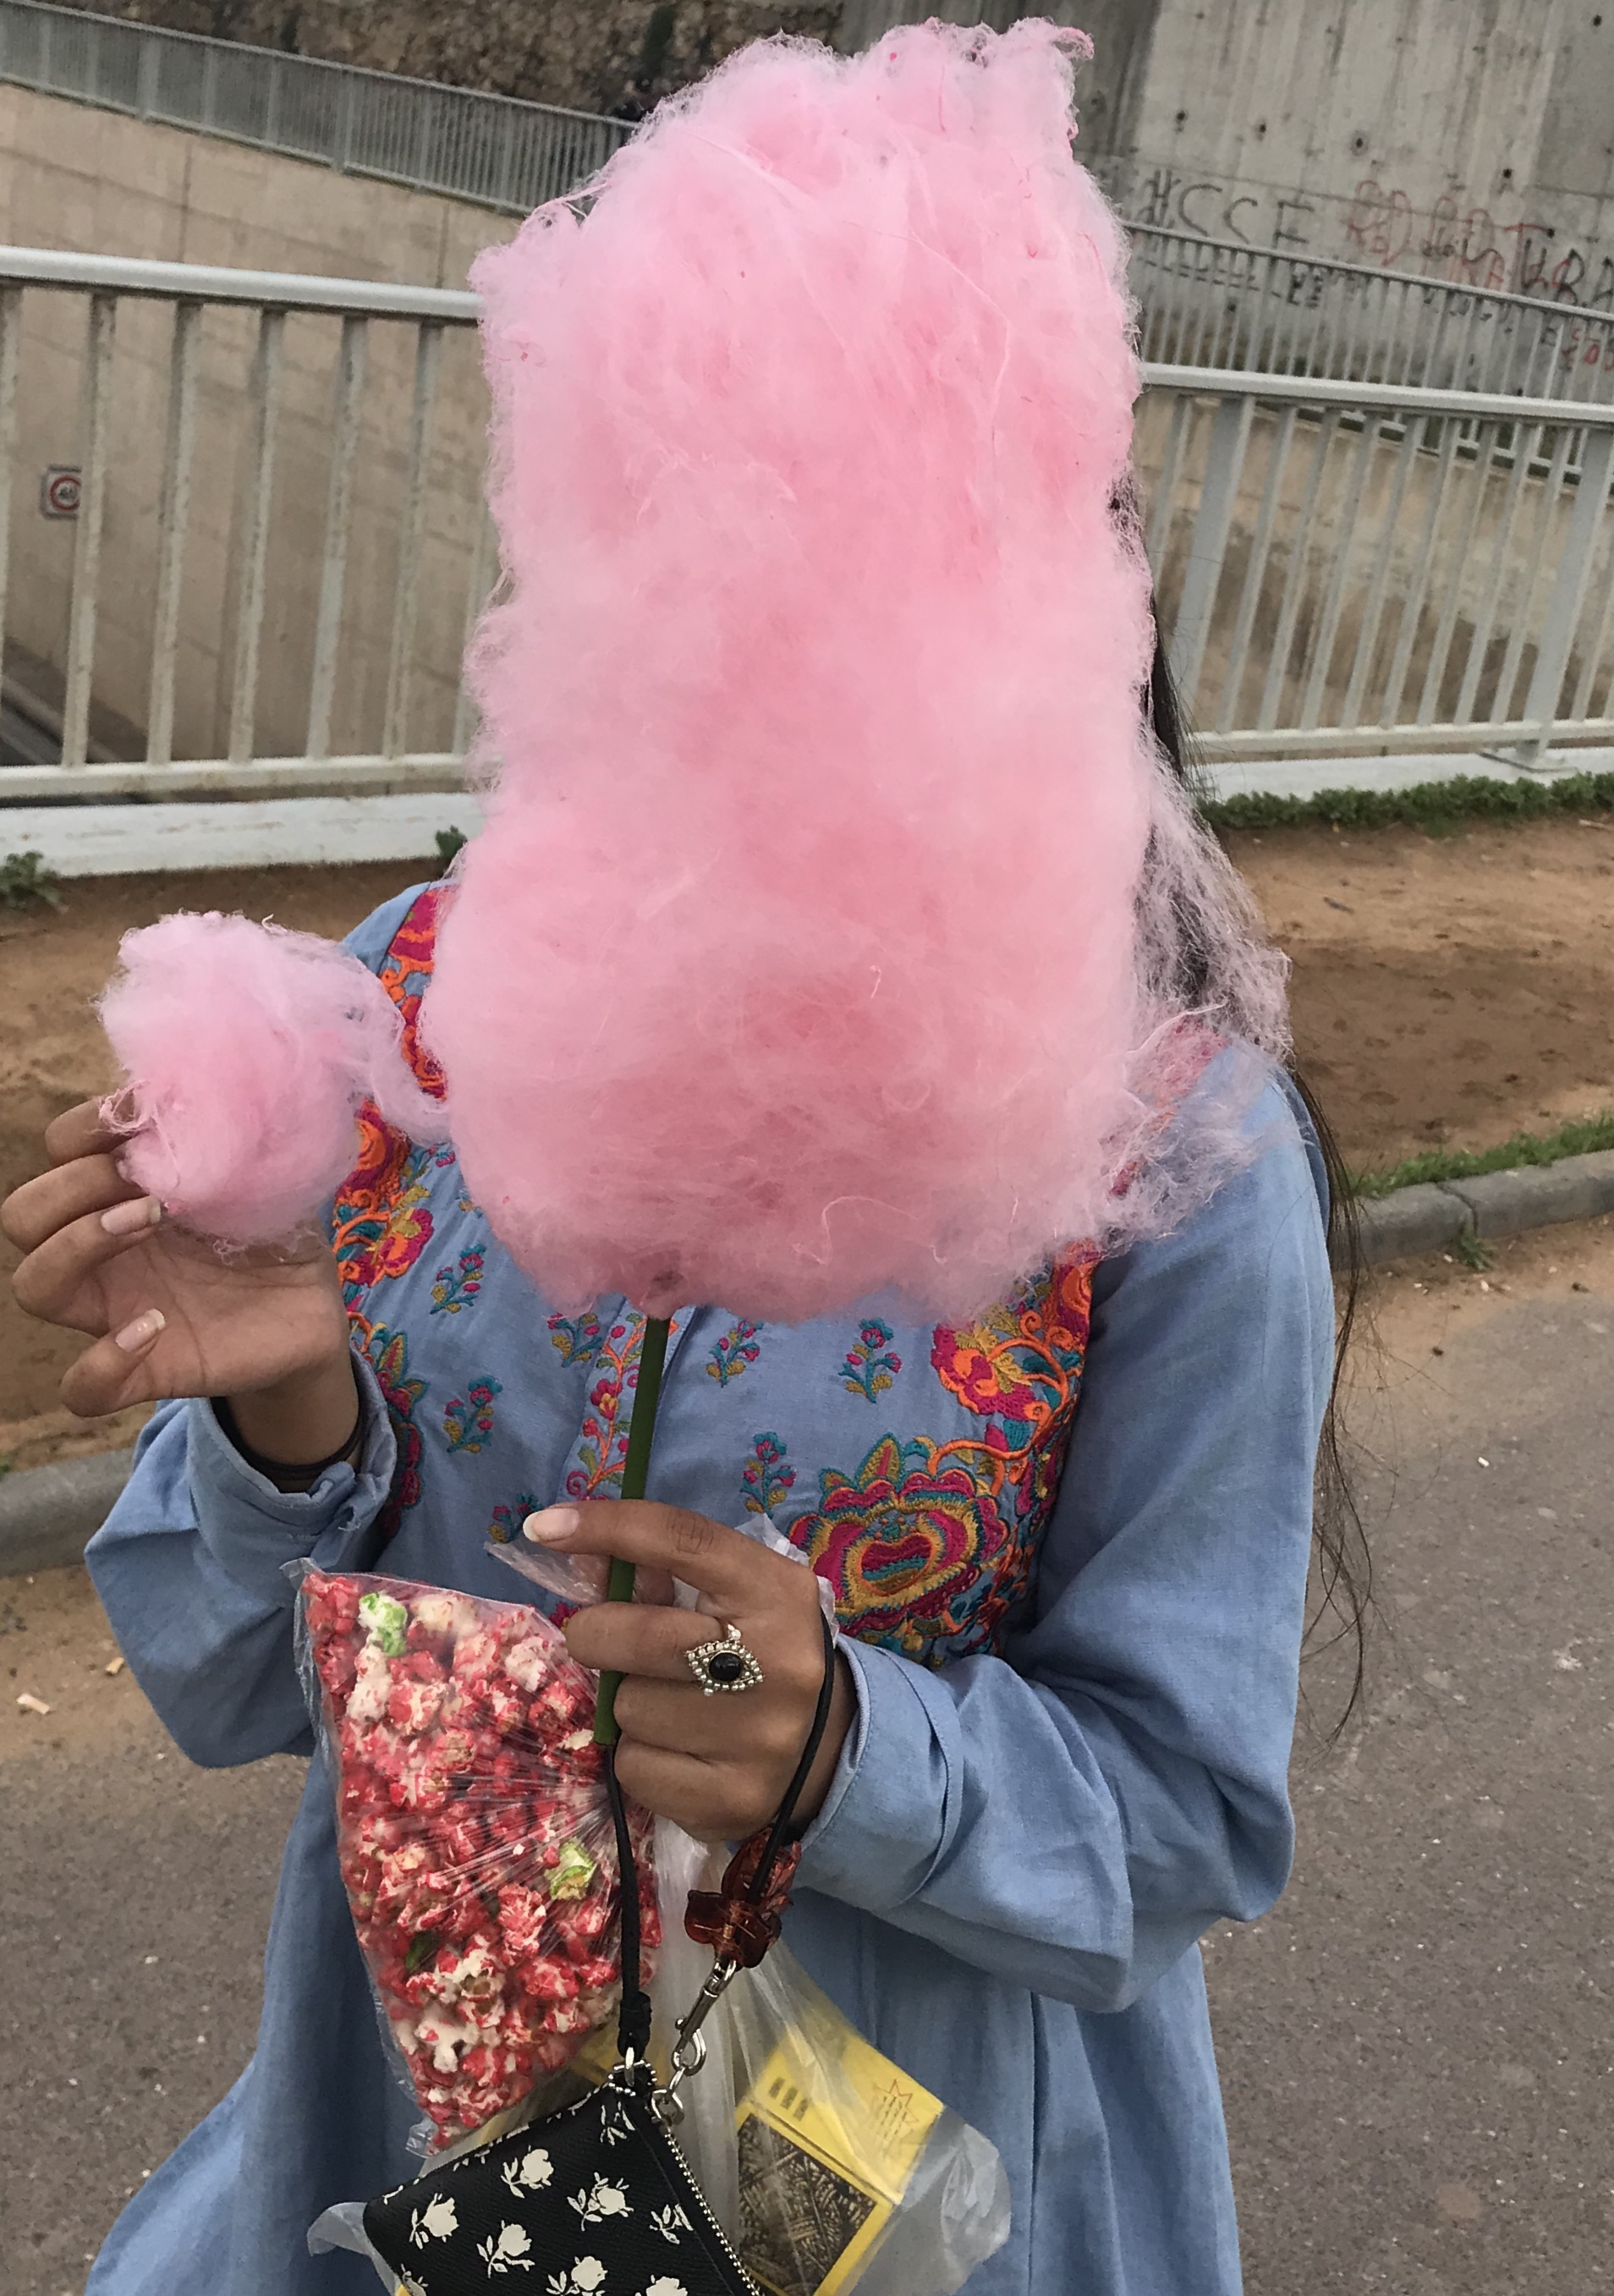 Enjoying cotton candy! Photo Credit: Ammarah Rehman, 2018.